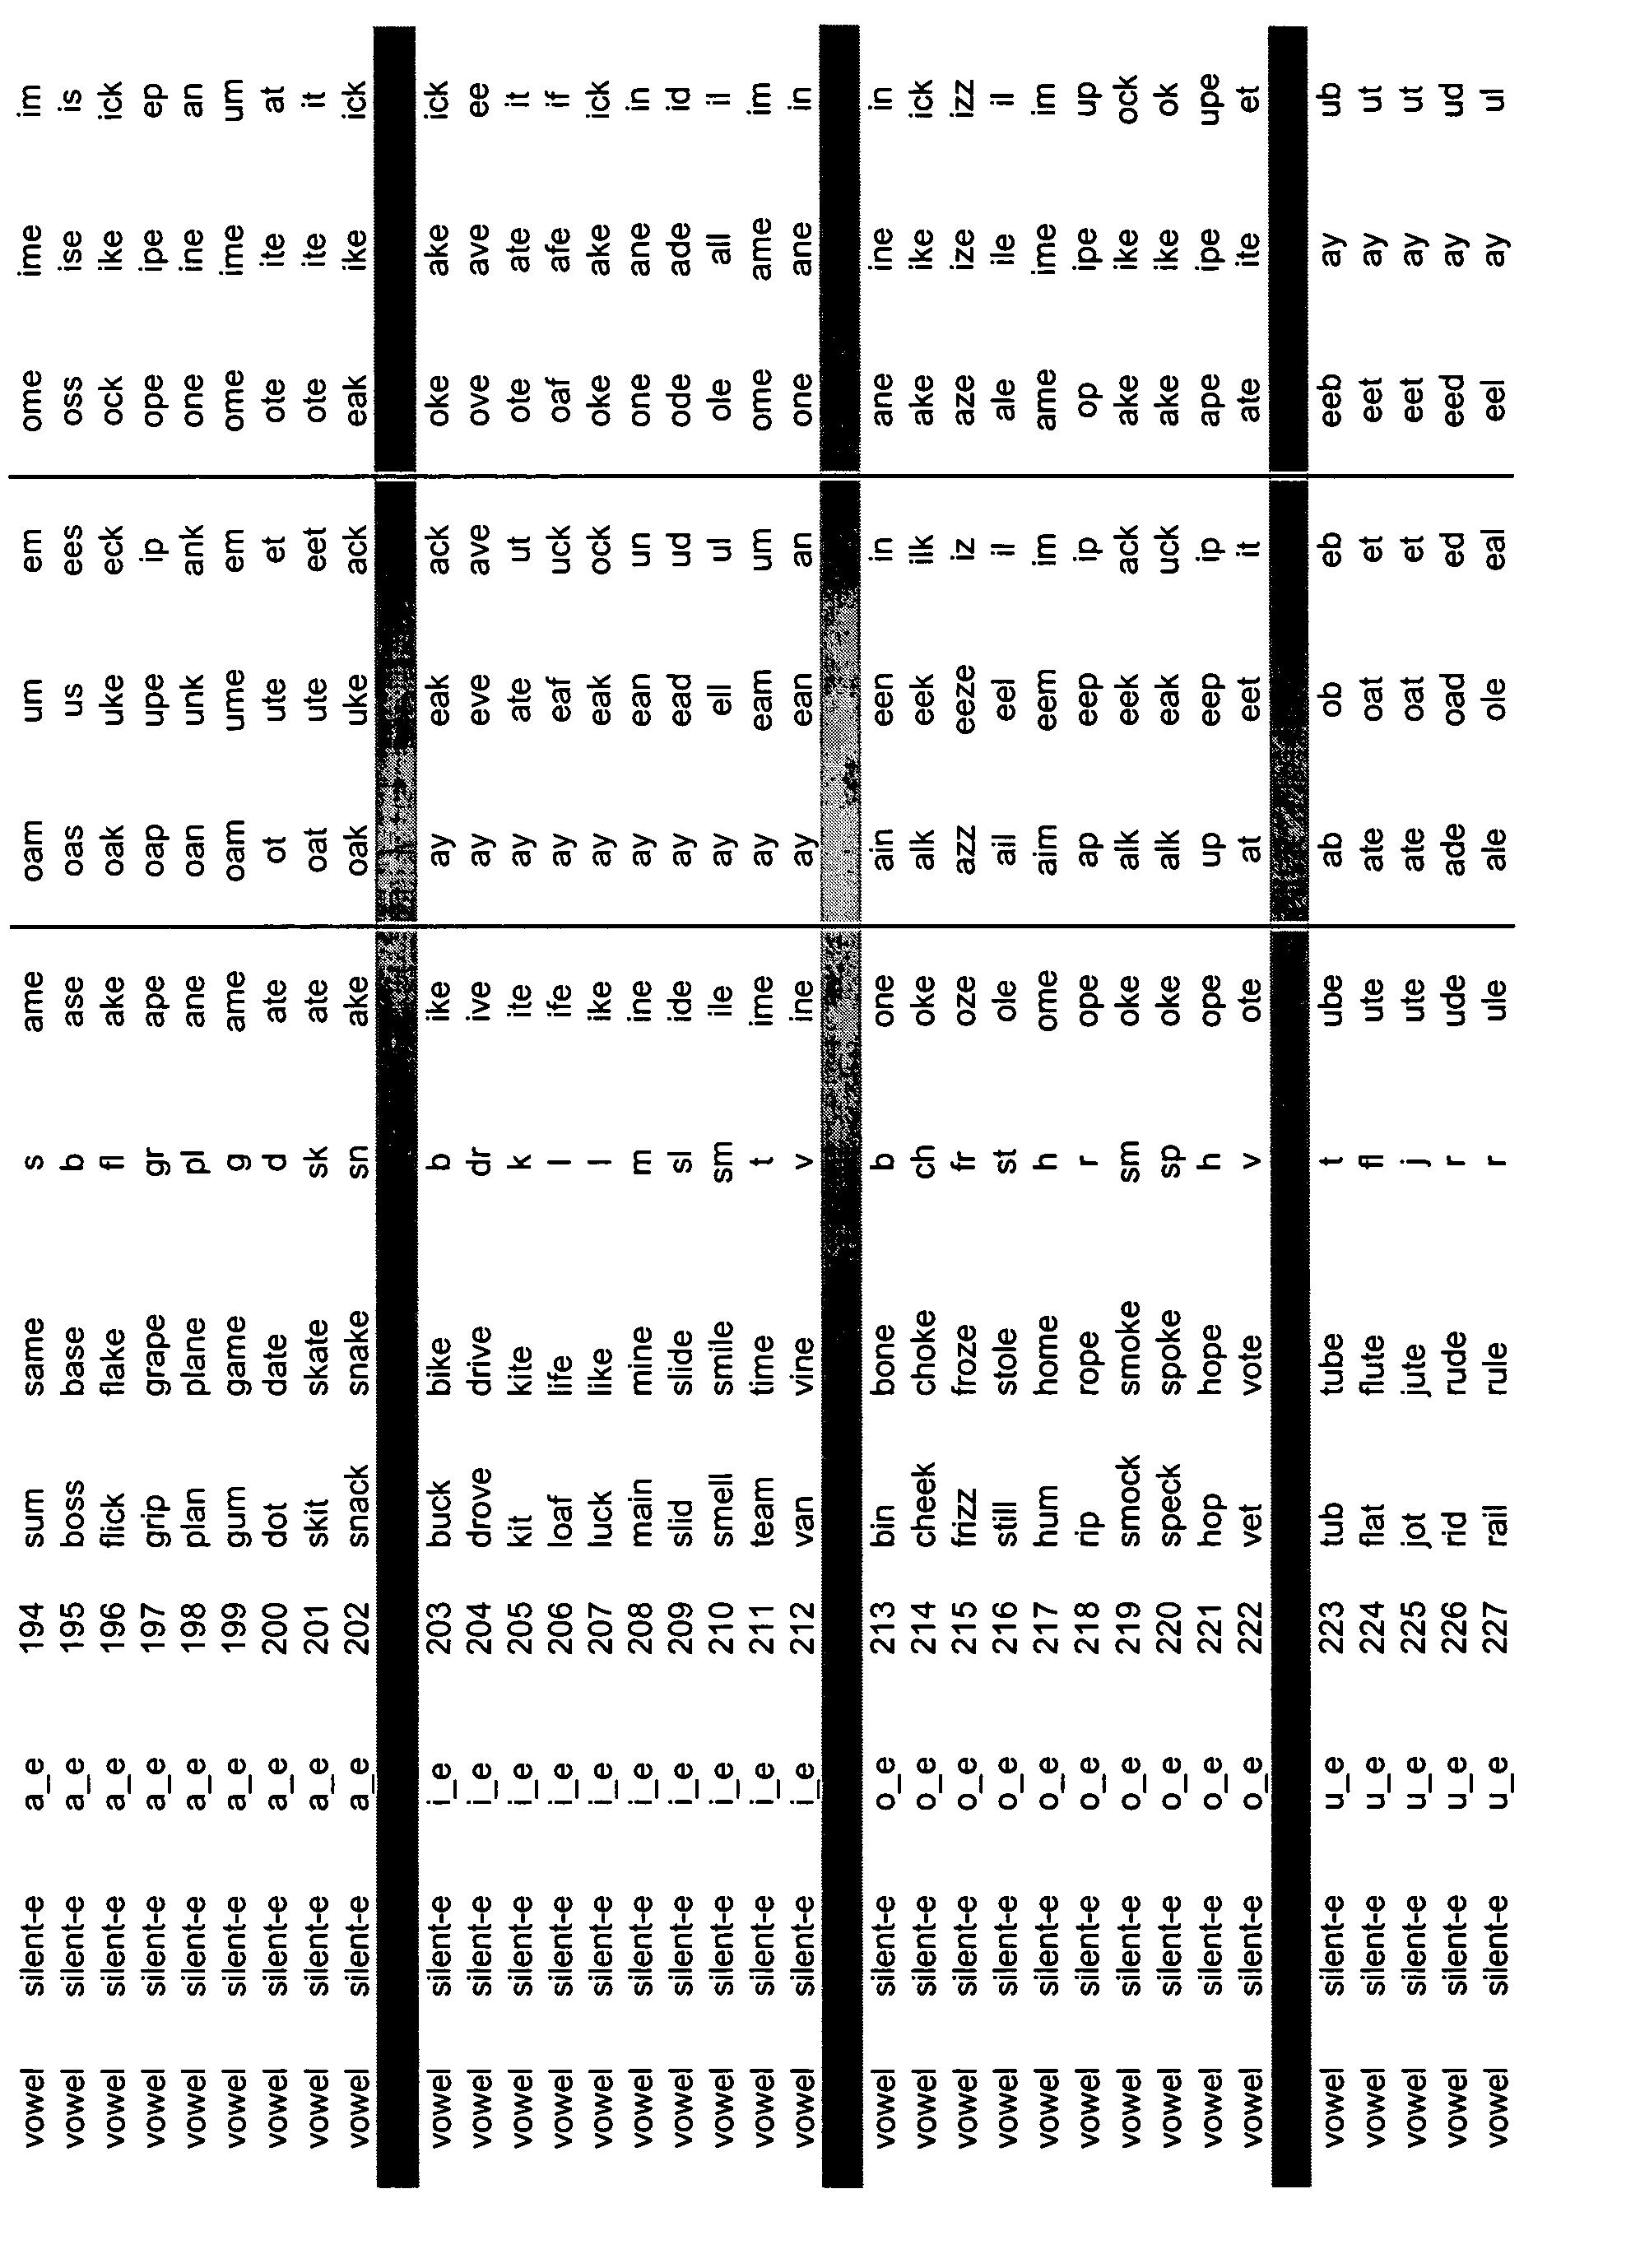 Figure US20050153263A1-20050714-P00058